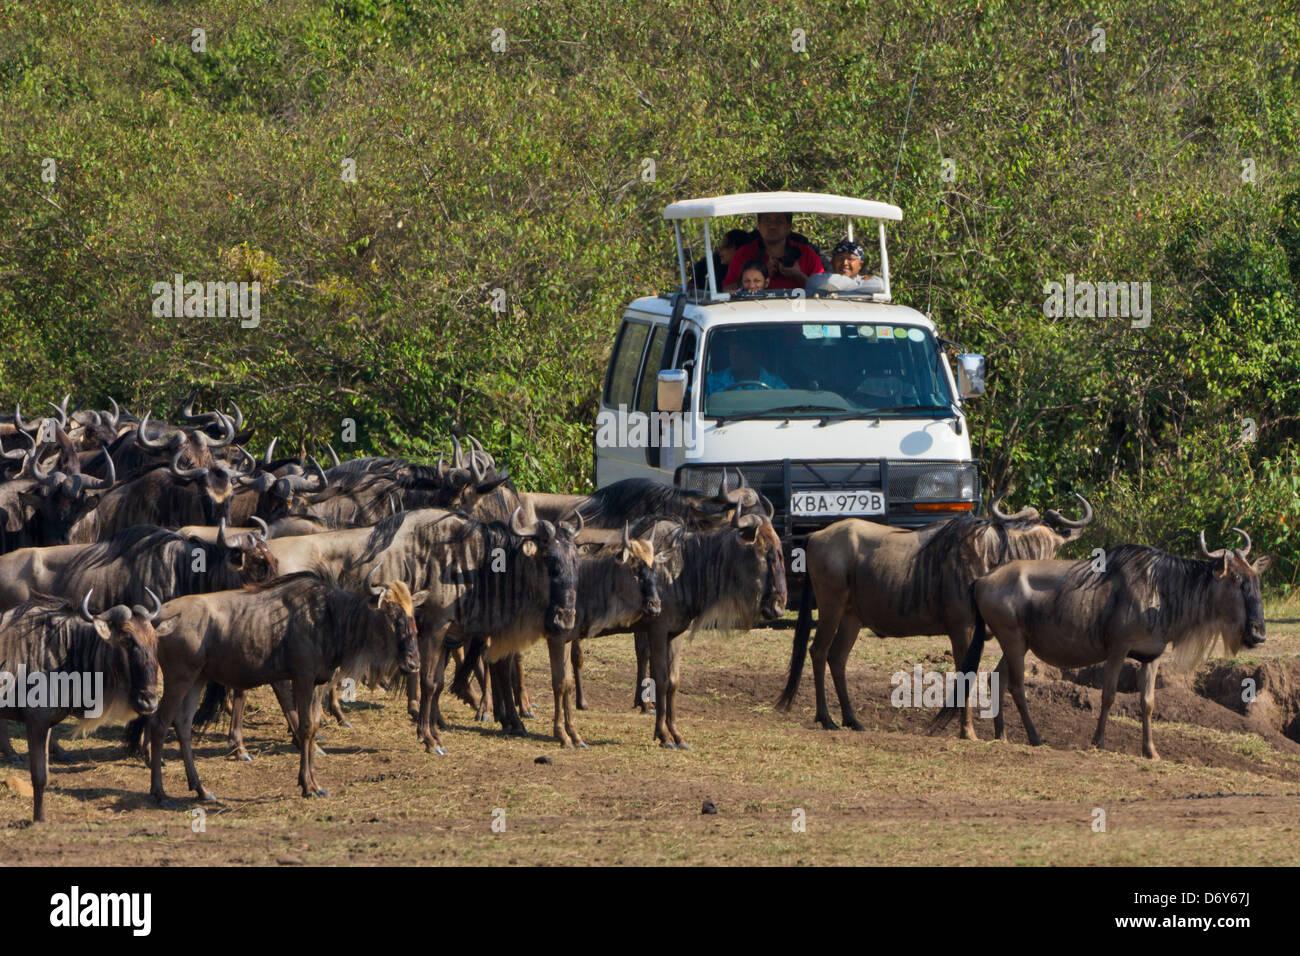 Jeep White Plains >> Safari jeep watching wildebeest migration, Masai Mara, Kenya Stock Photo, Royalty Free Image ...